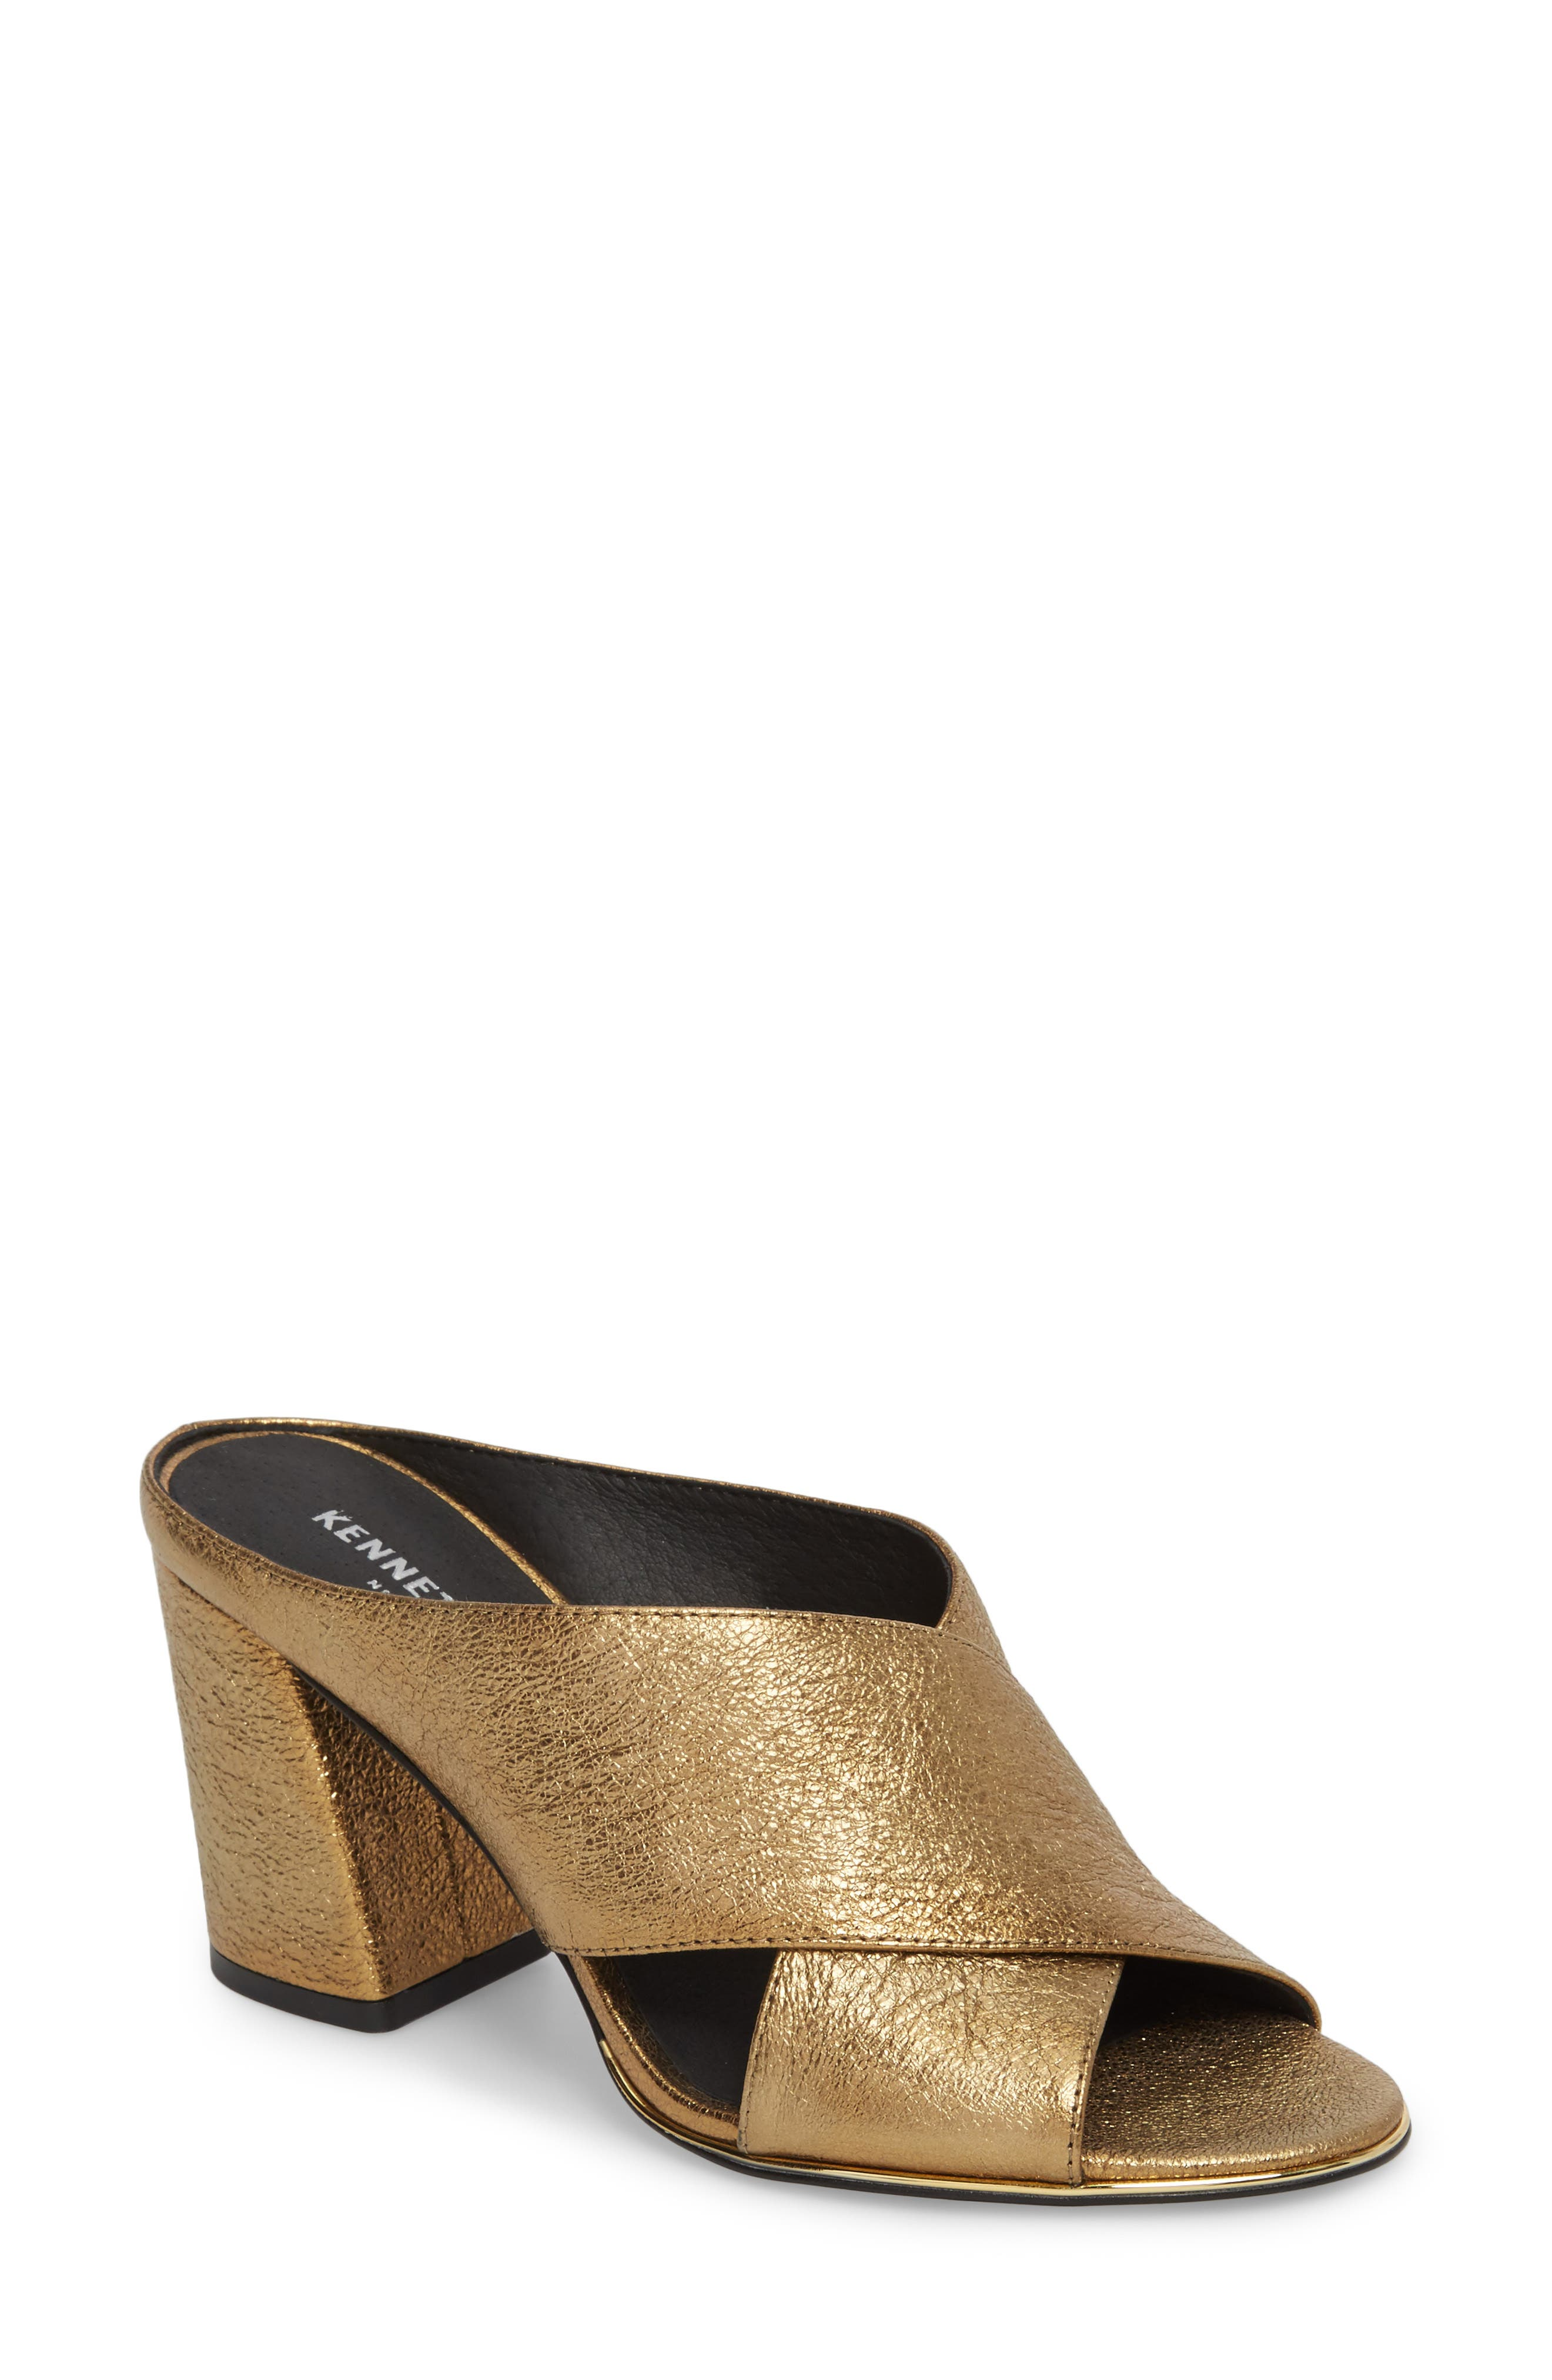 Lyra Sandal,                             Main thumbnail 1, color,                             Gold Metallic Leather